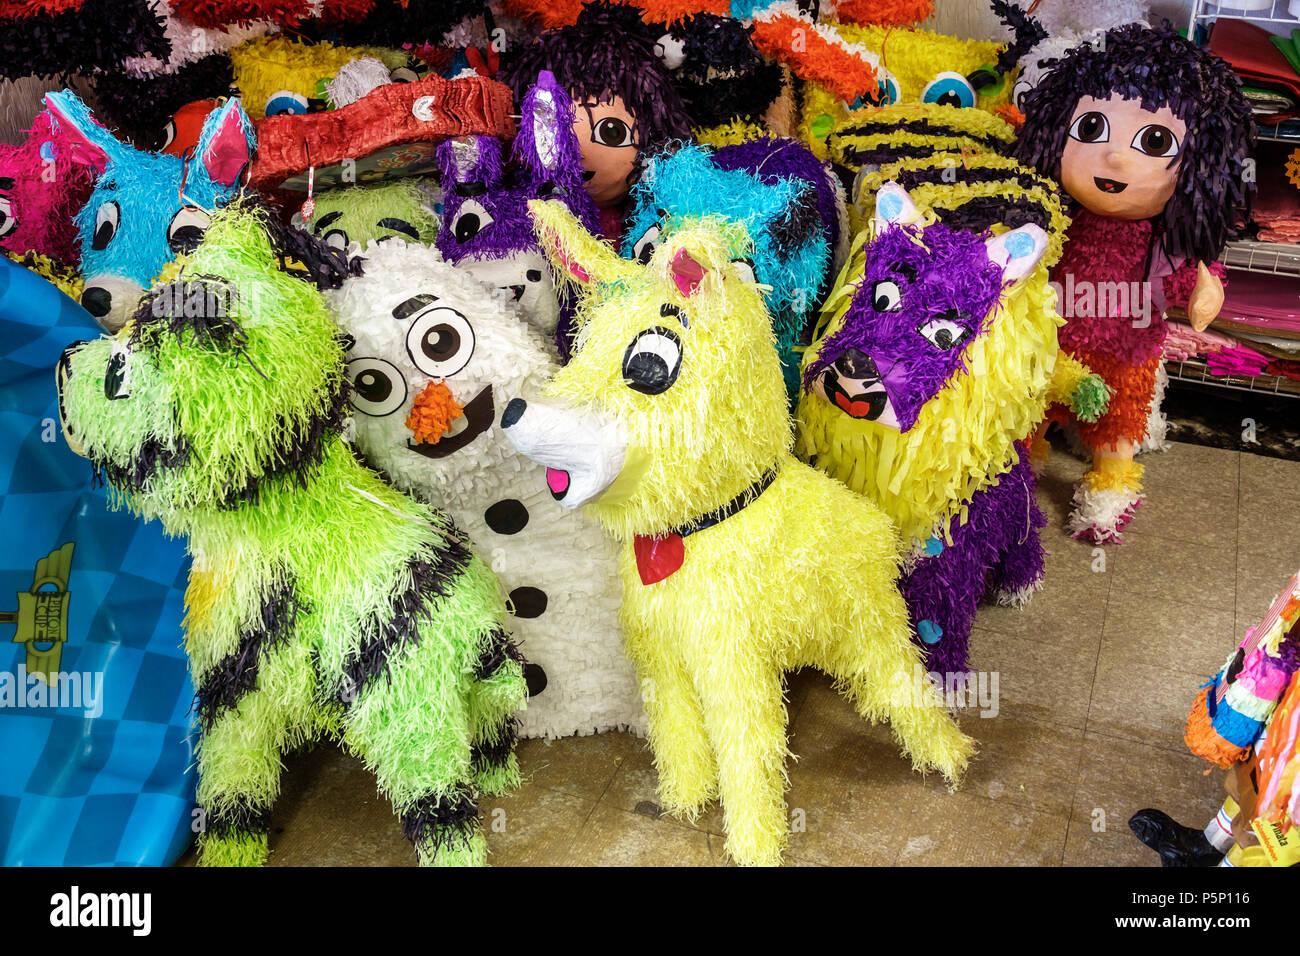 Immokalee Florida's Mimi Piñatas Interieur shopping Party supplies Store piñatas Pappmaché Anzeige Verkauf Stockbild